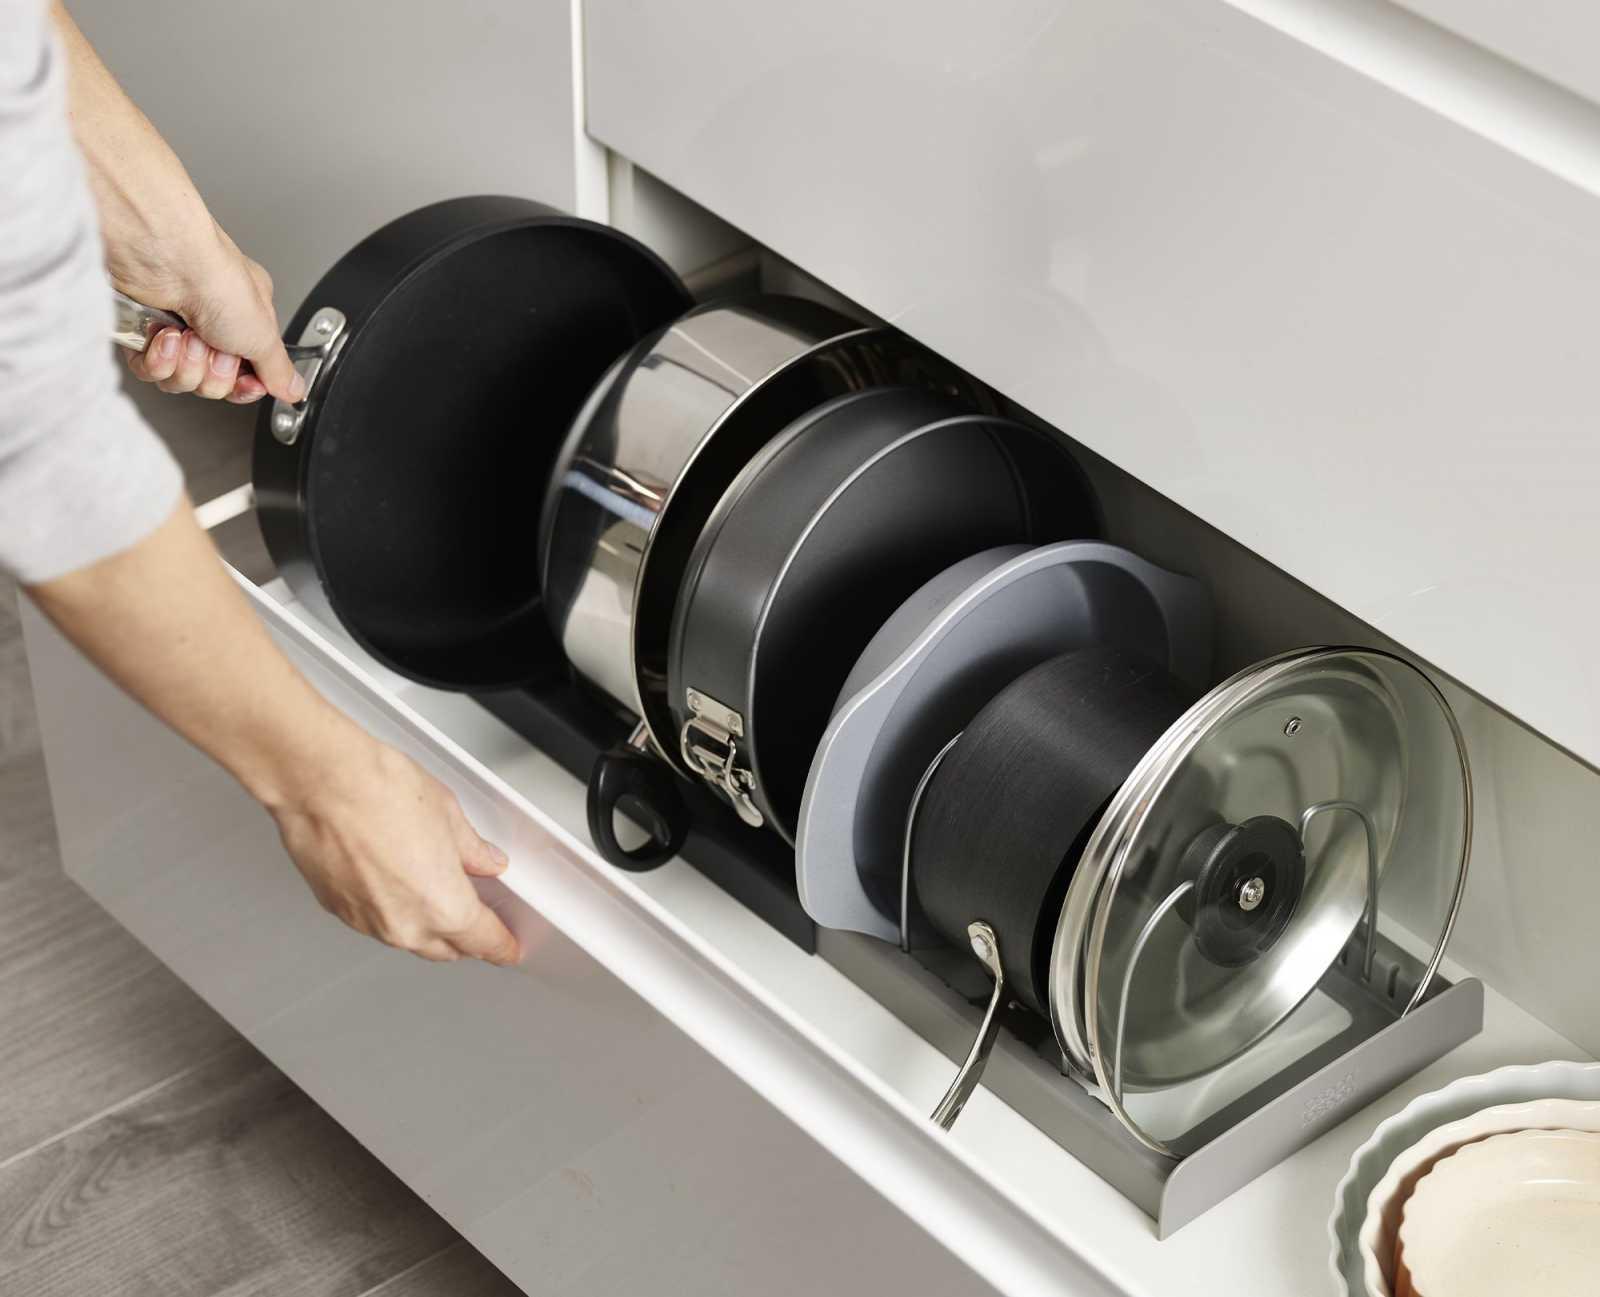 Органайзер для сушки посуды раскладной Joseph Joseph DRAWERSTORE, серый Joseph Joseph 85167 фото 3